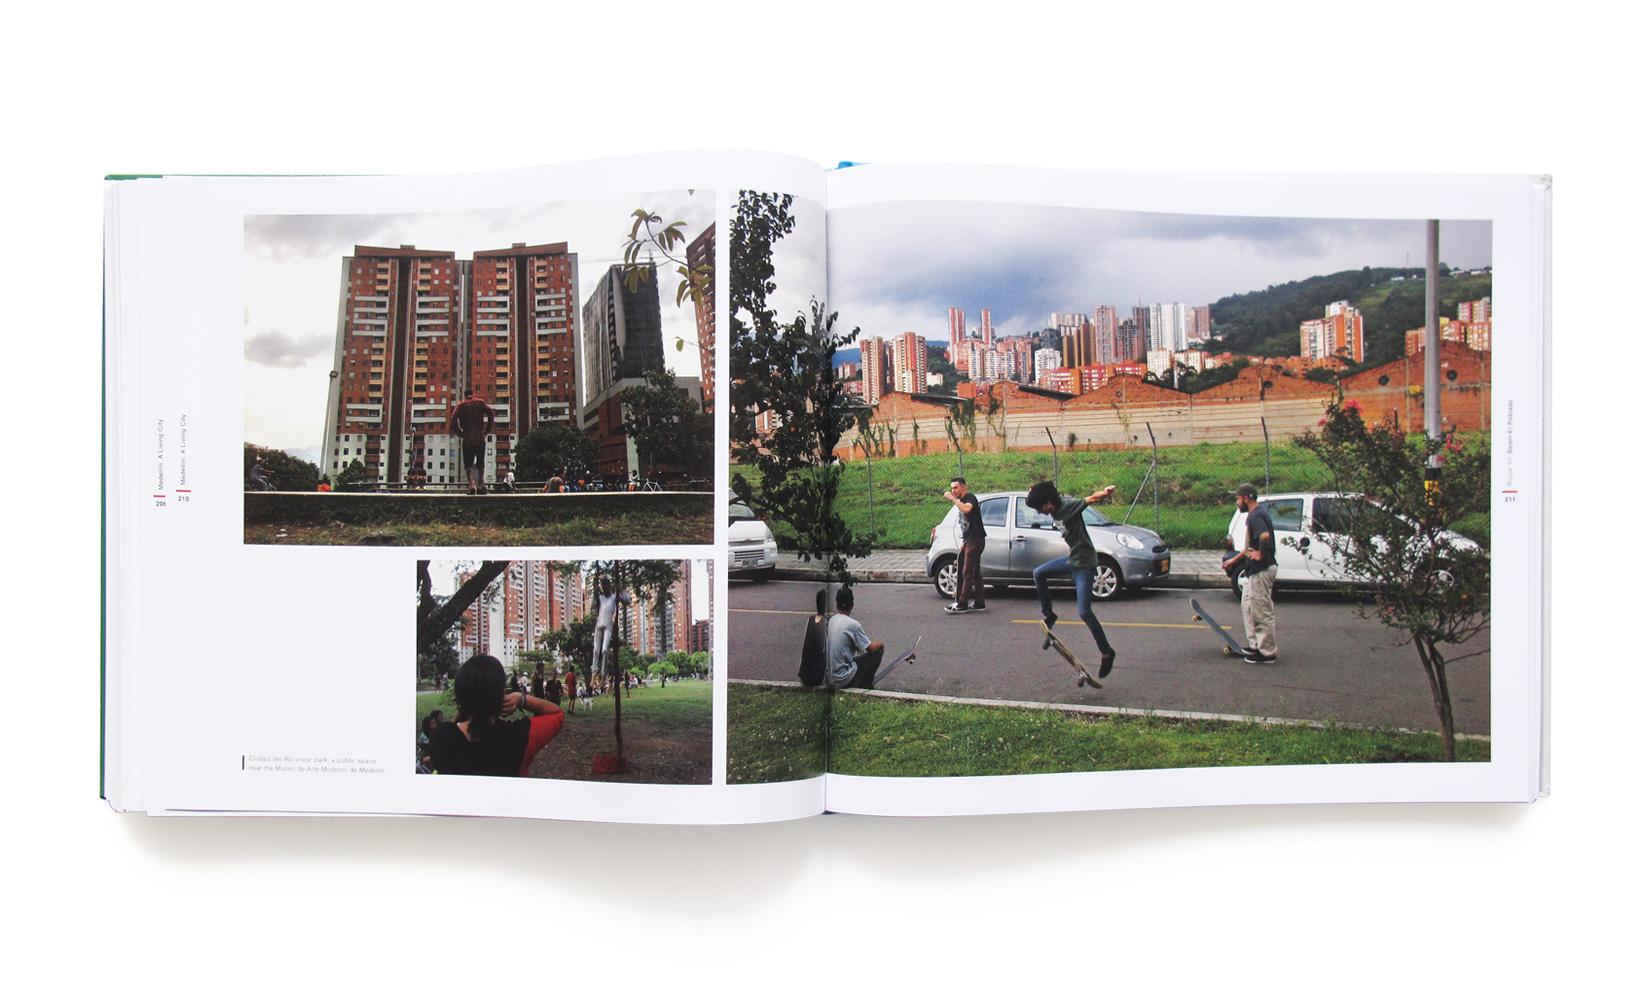 Medellin-p7.jpg